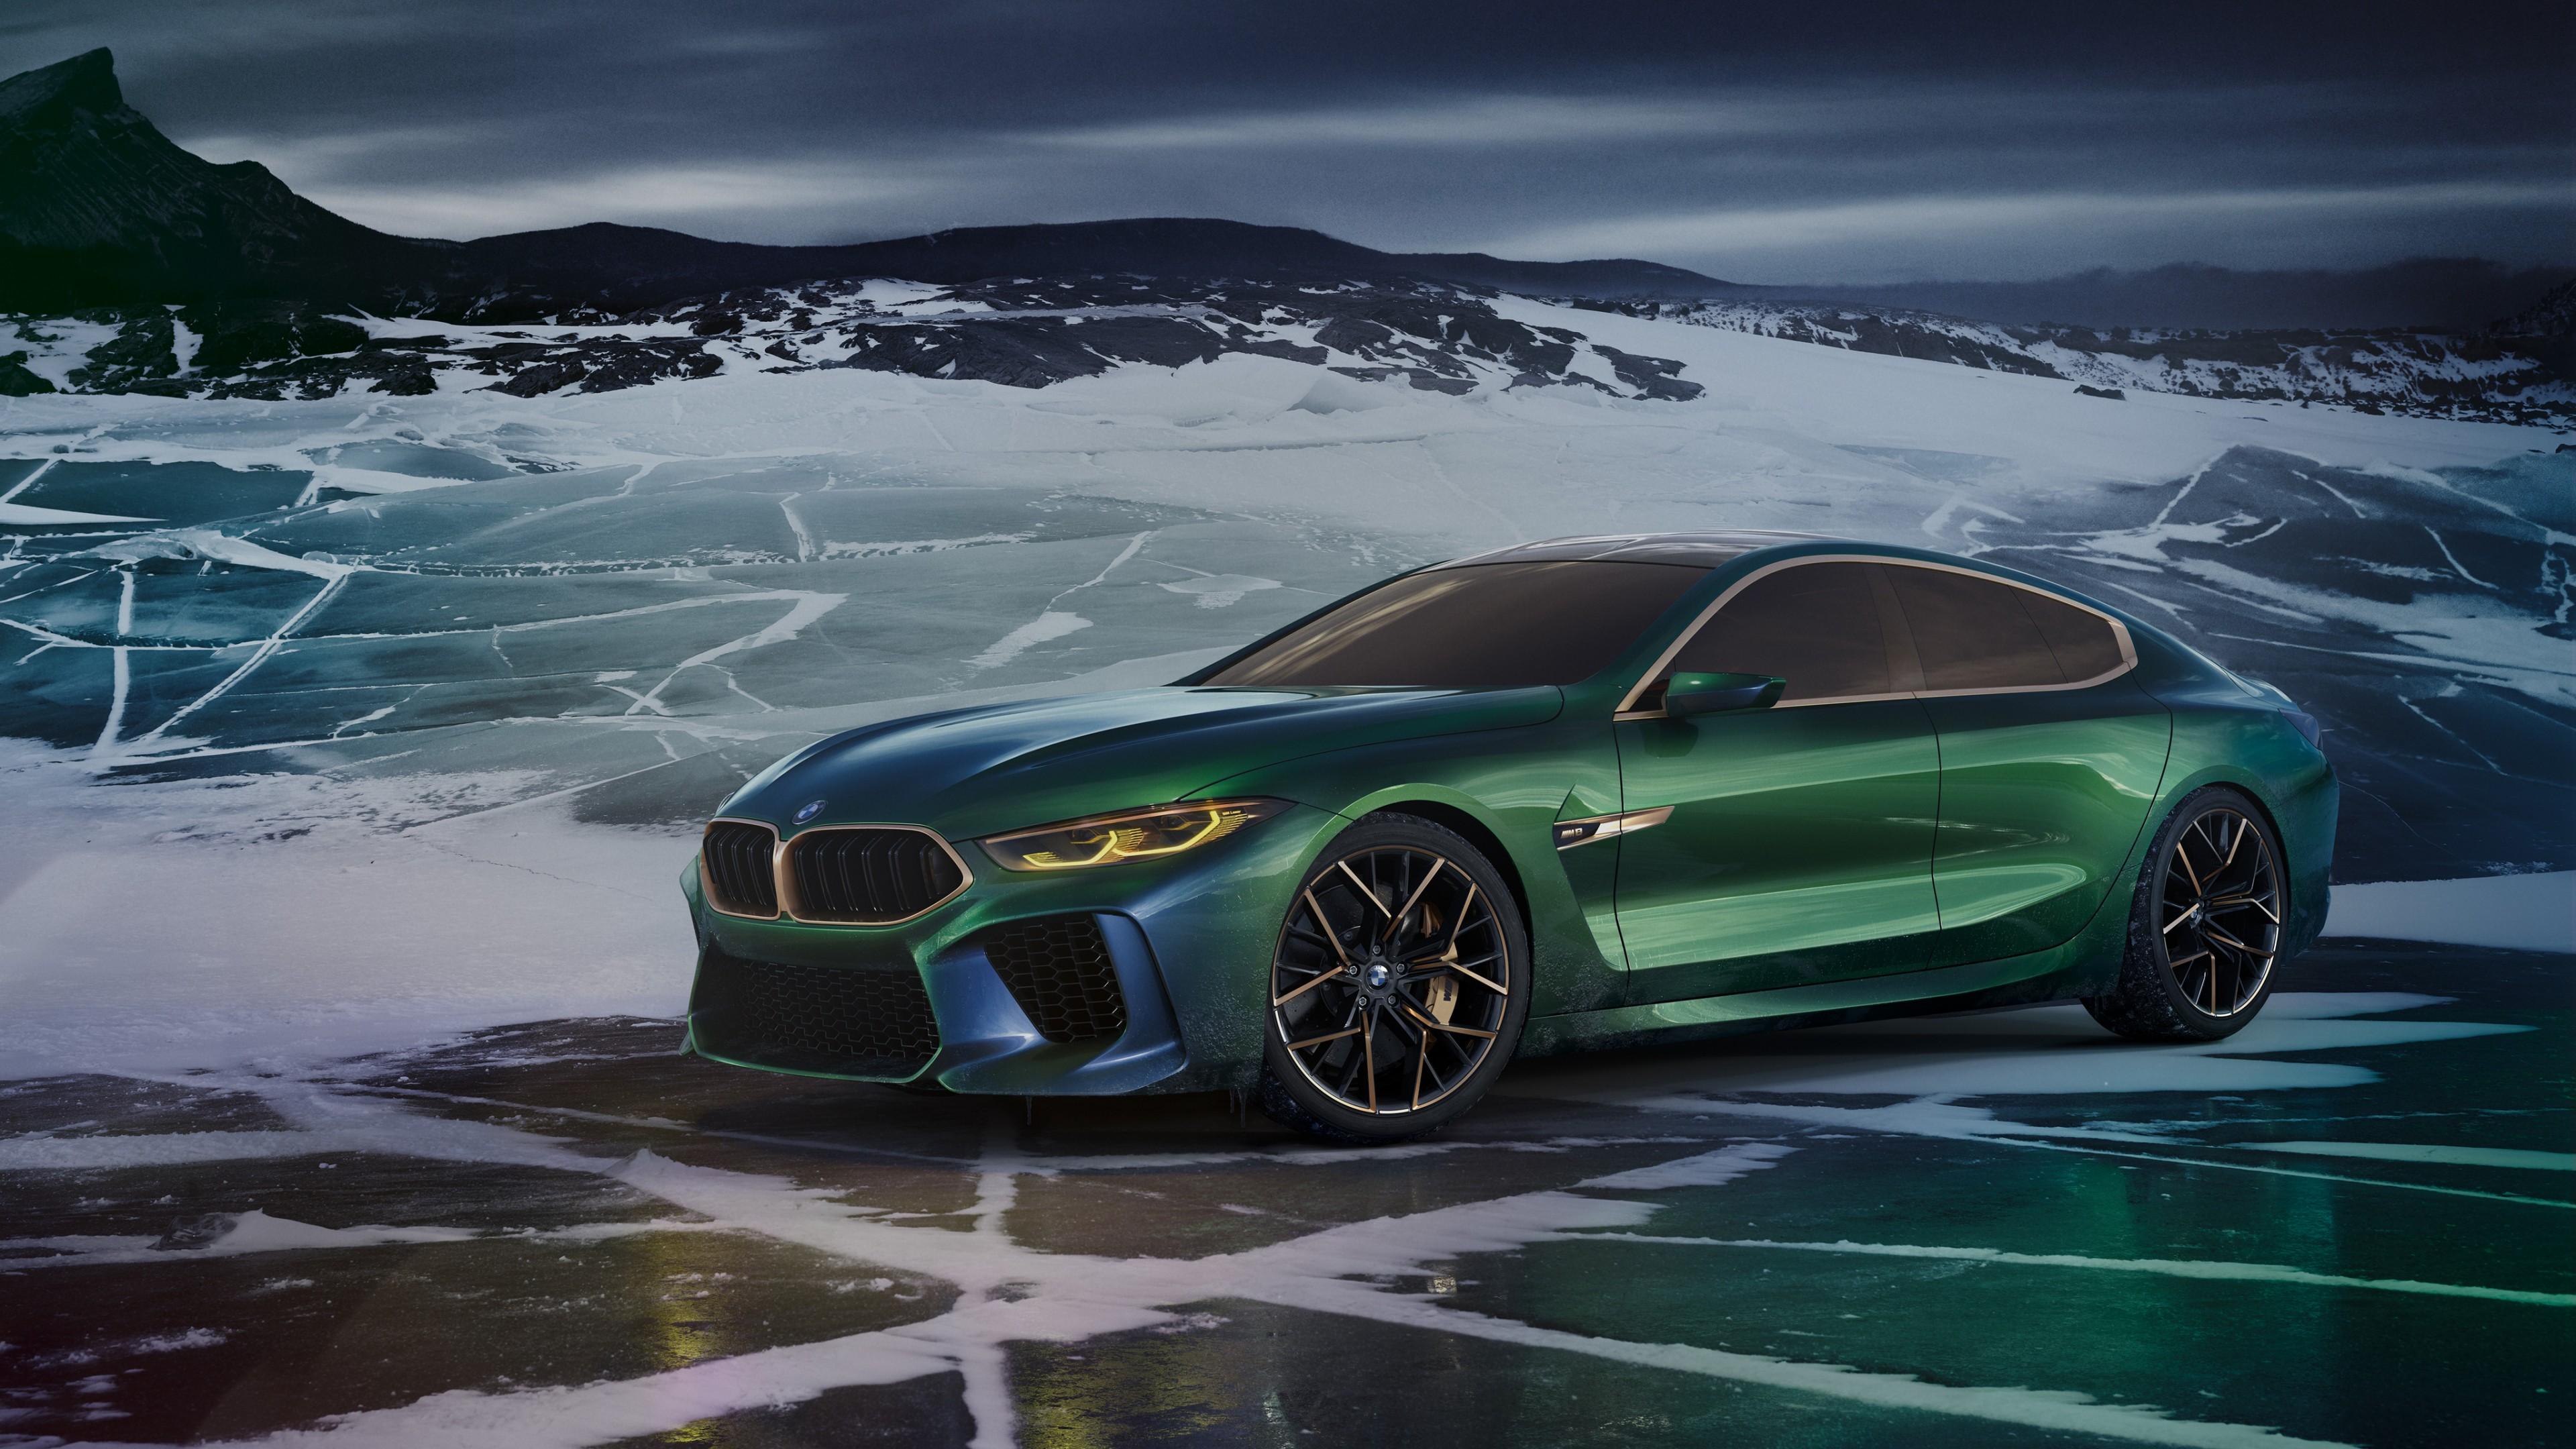 Lexus 2018 Suv >> Wallpaper BMV M8 Gran Coupe, Geneva Motor Show 2018, 4k ...